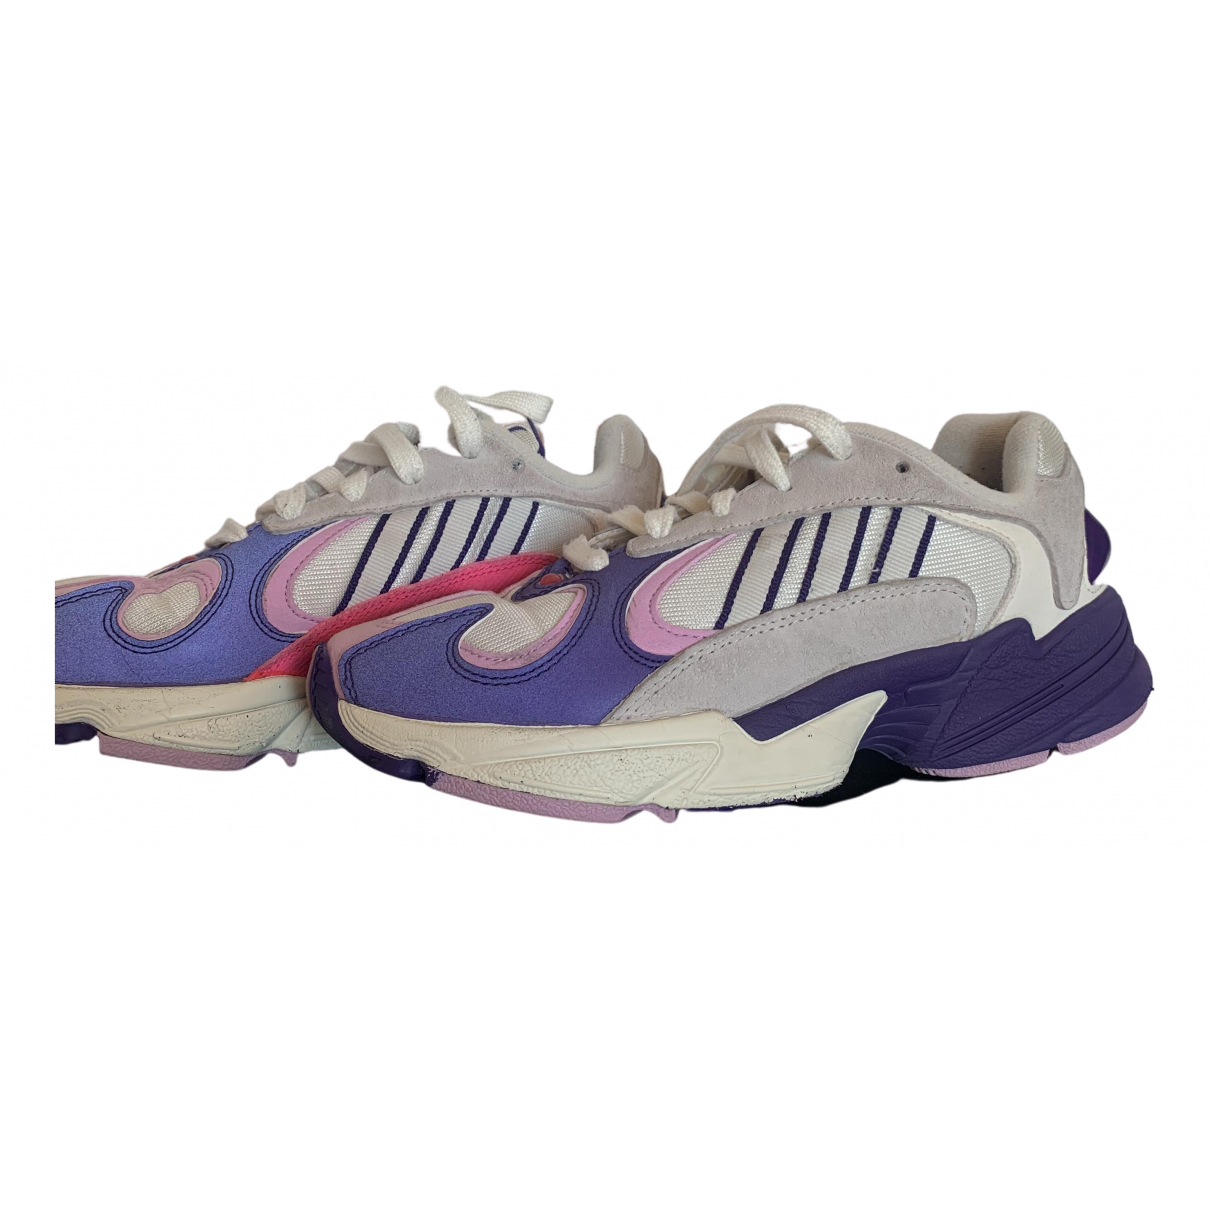 Adidas Yung-1 Sneakers in  Lila Kunststoff